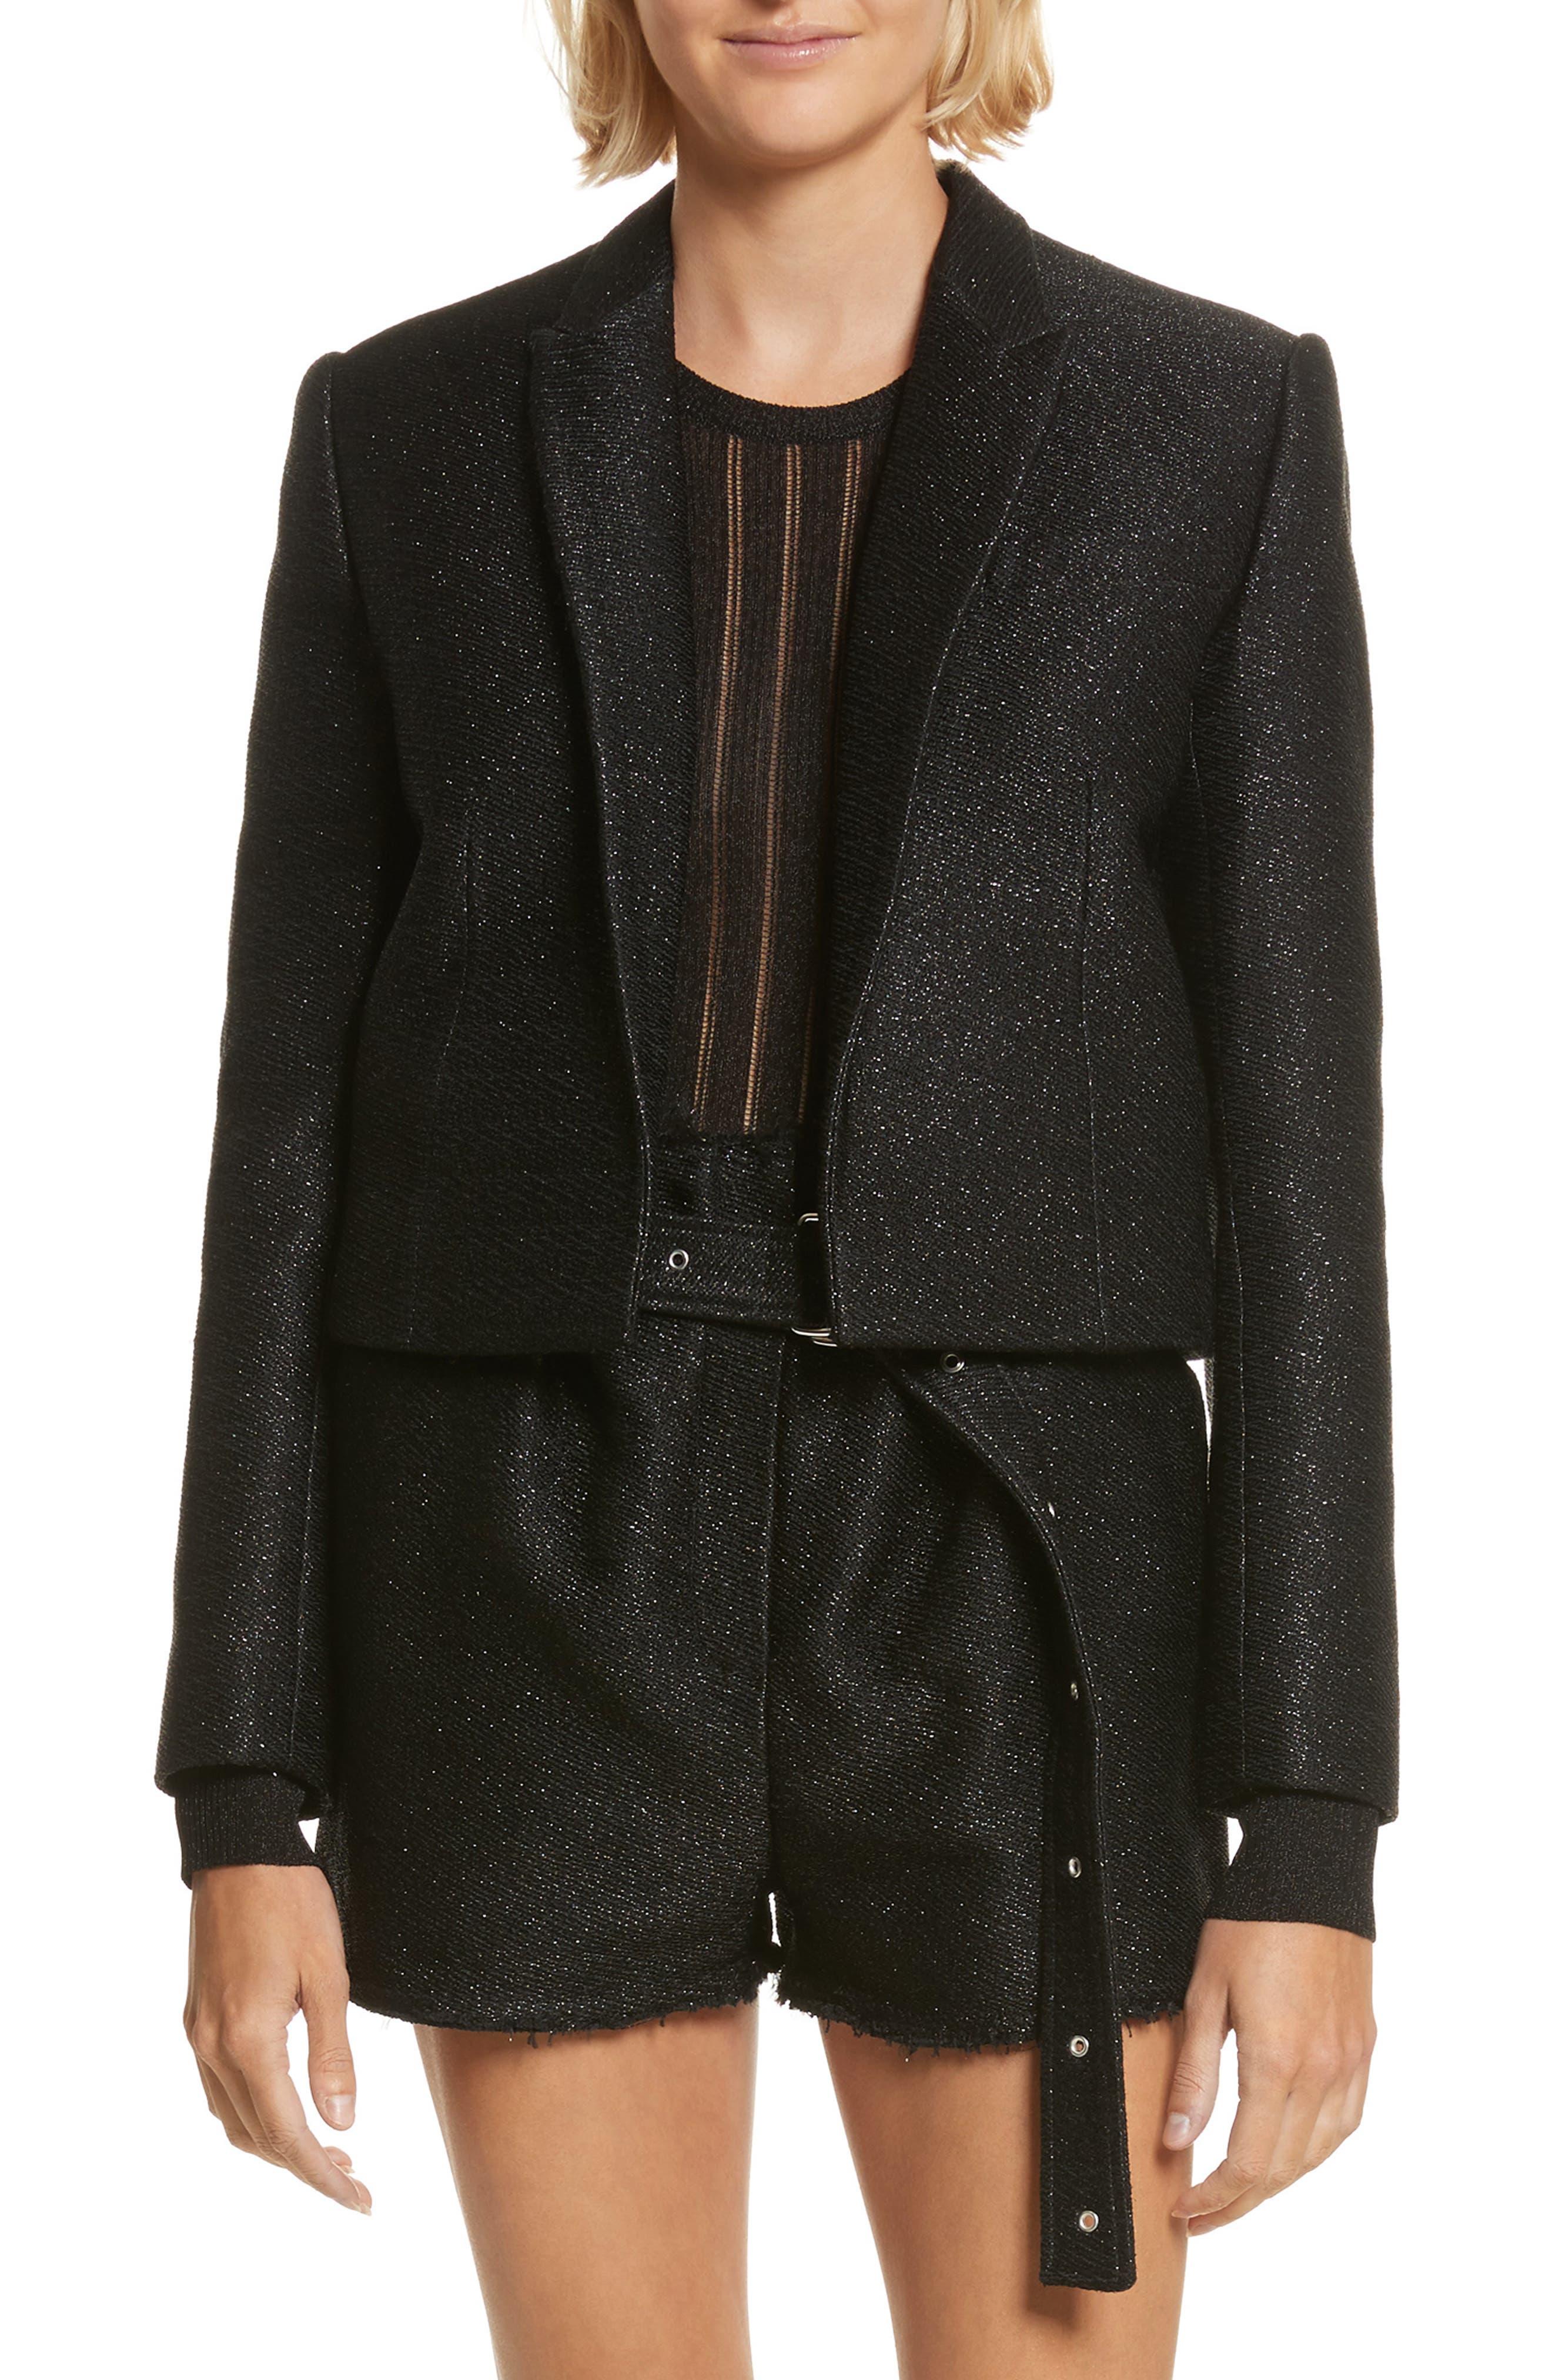 Cholanja Metallic Jacket,                         Main,                         color, Black